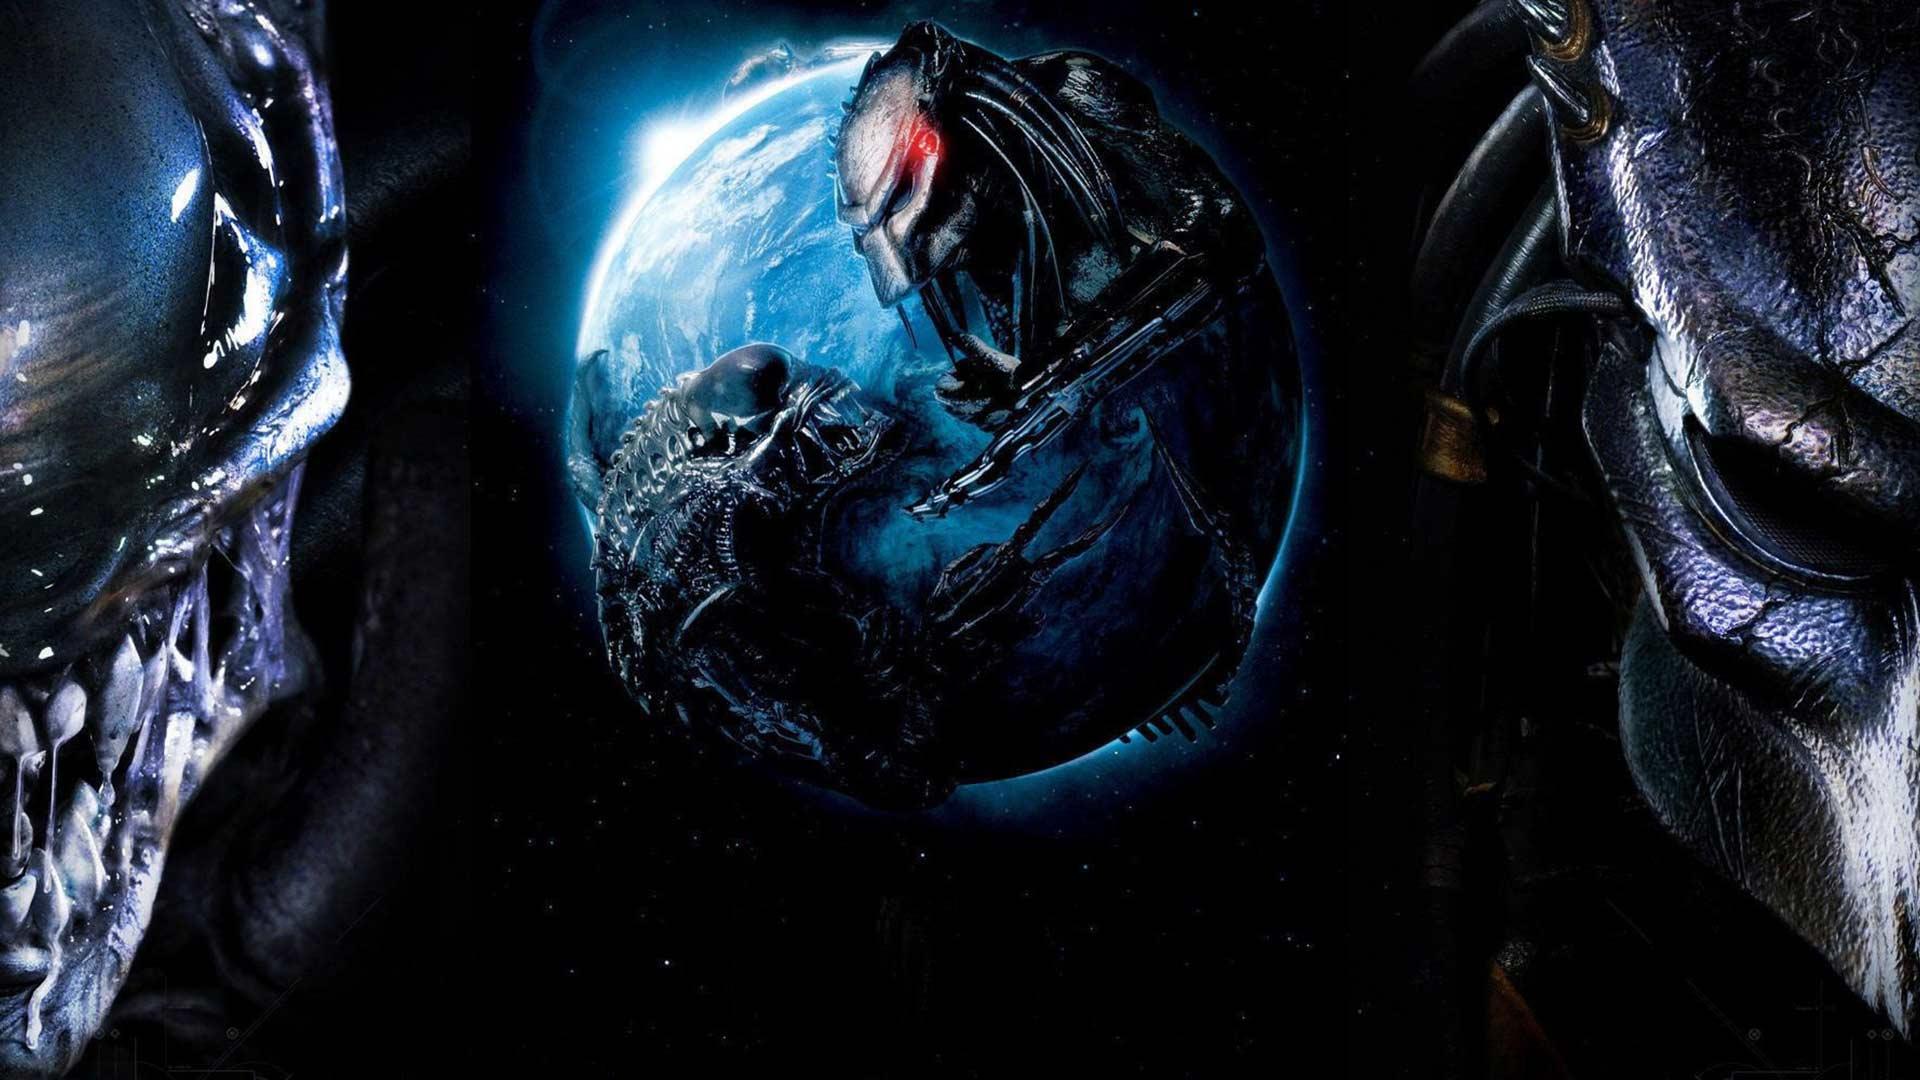 Movies Alien Wallpaper 1920x1080 Movies Alien 80s James 1920x1080